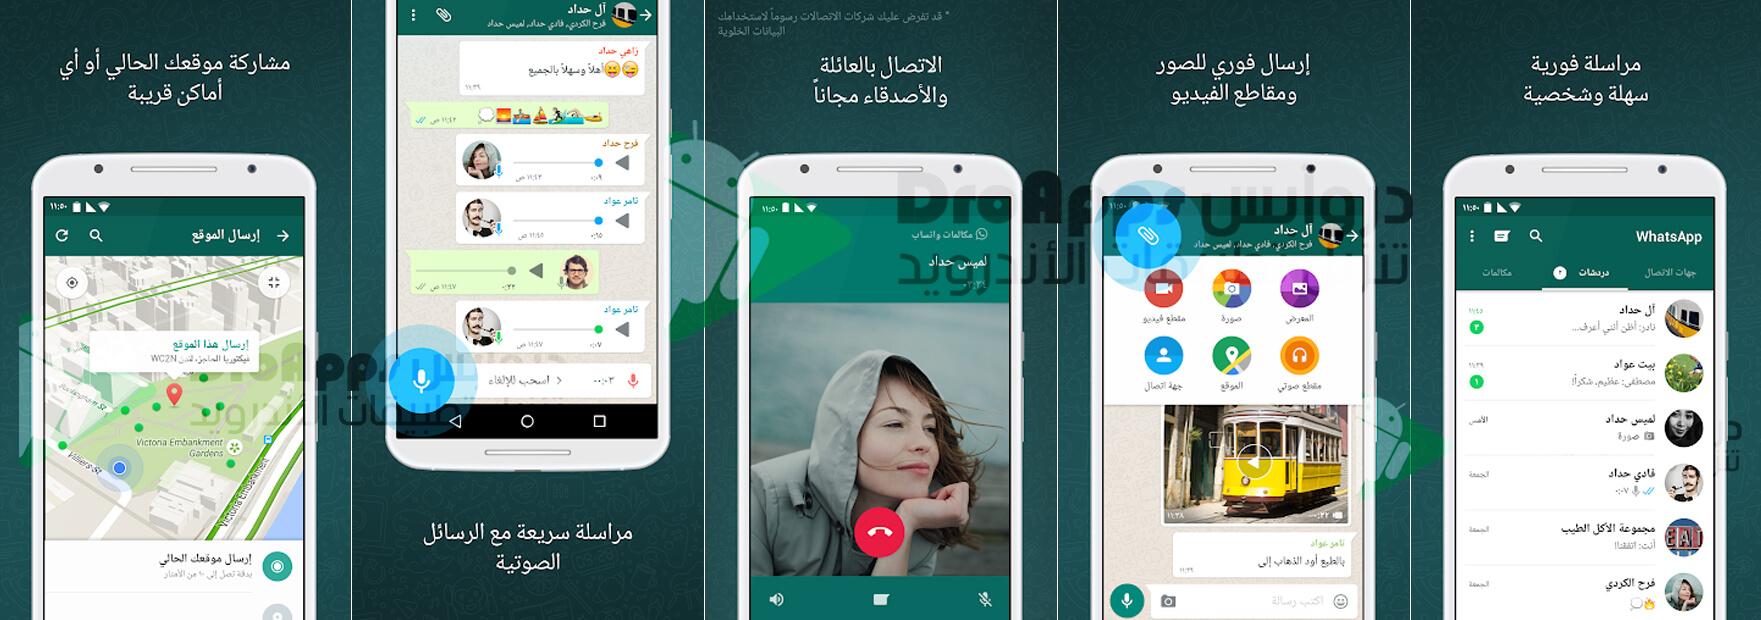 لقطات شاشة تطبيق واتساب مسنجر WhatsApp Messenger